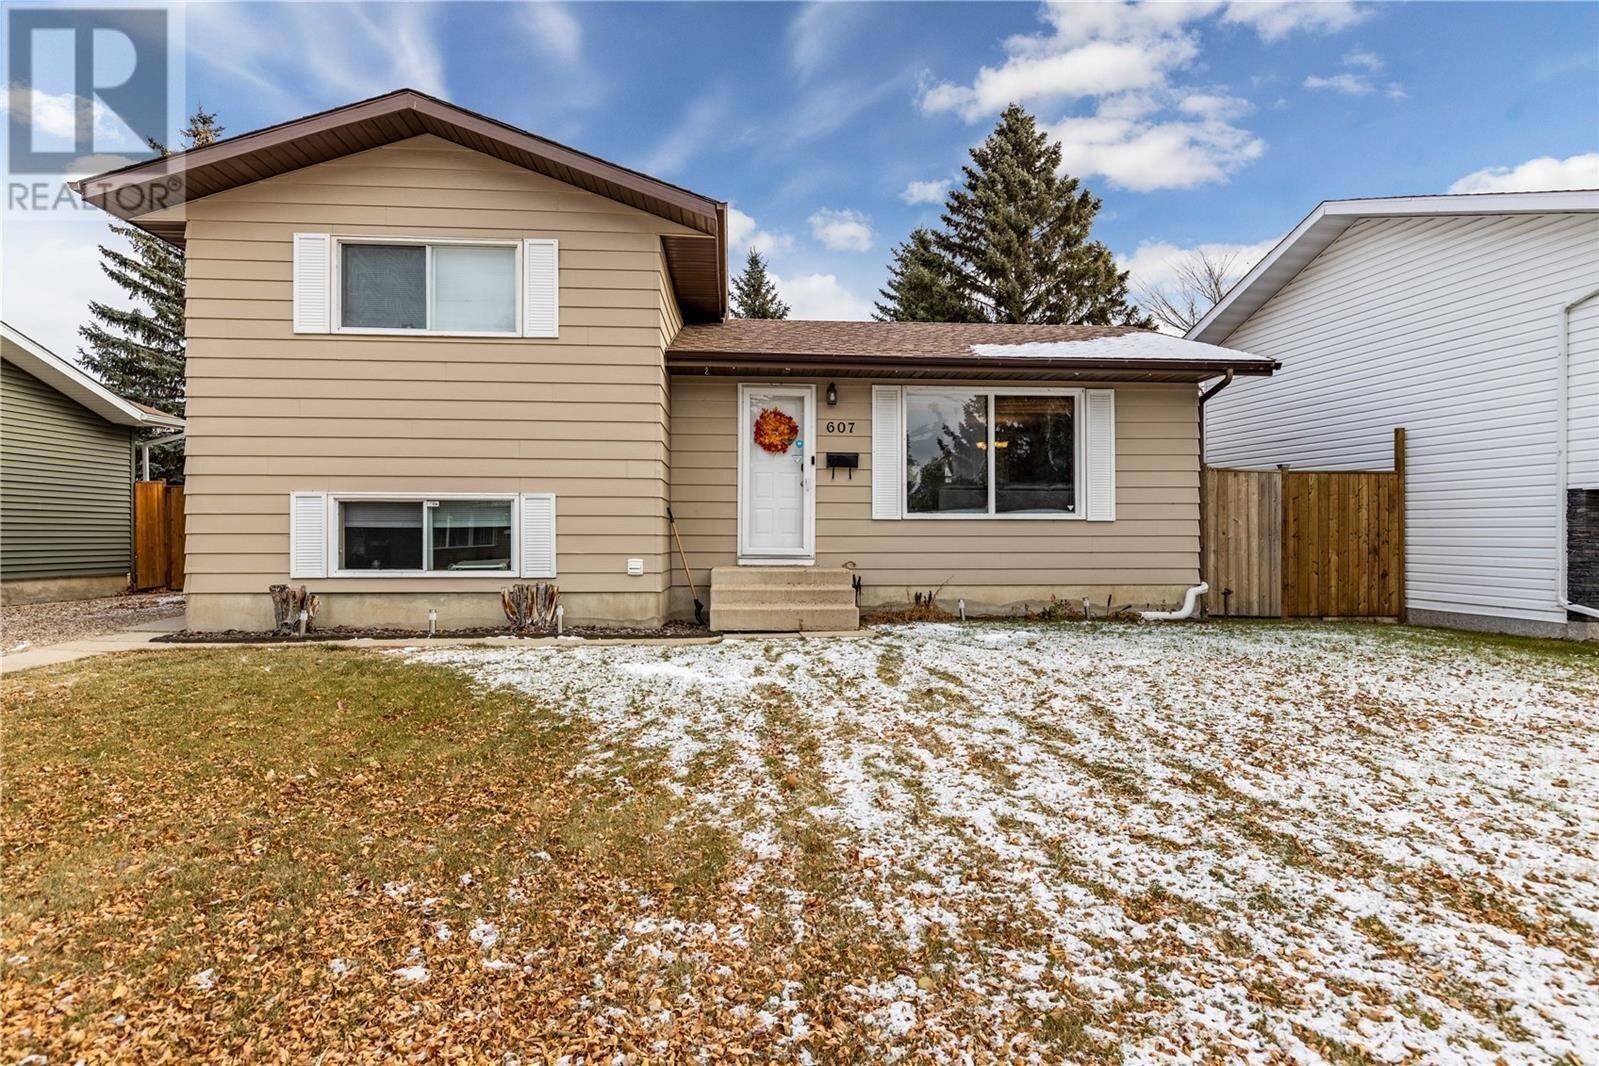 House for sale at 607 Priel Cres Saskatoon Saskatchewan - MLS: SK831306